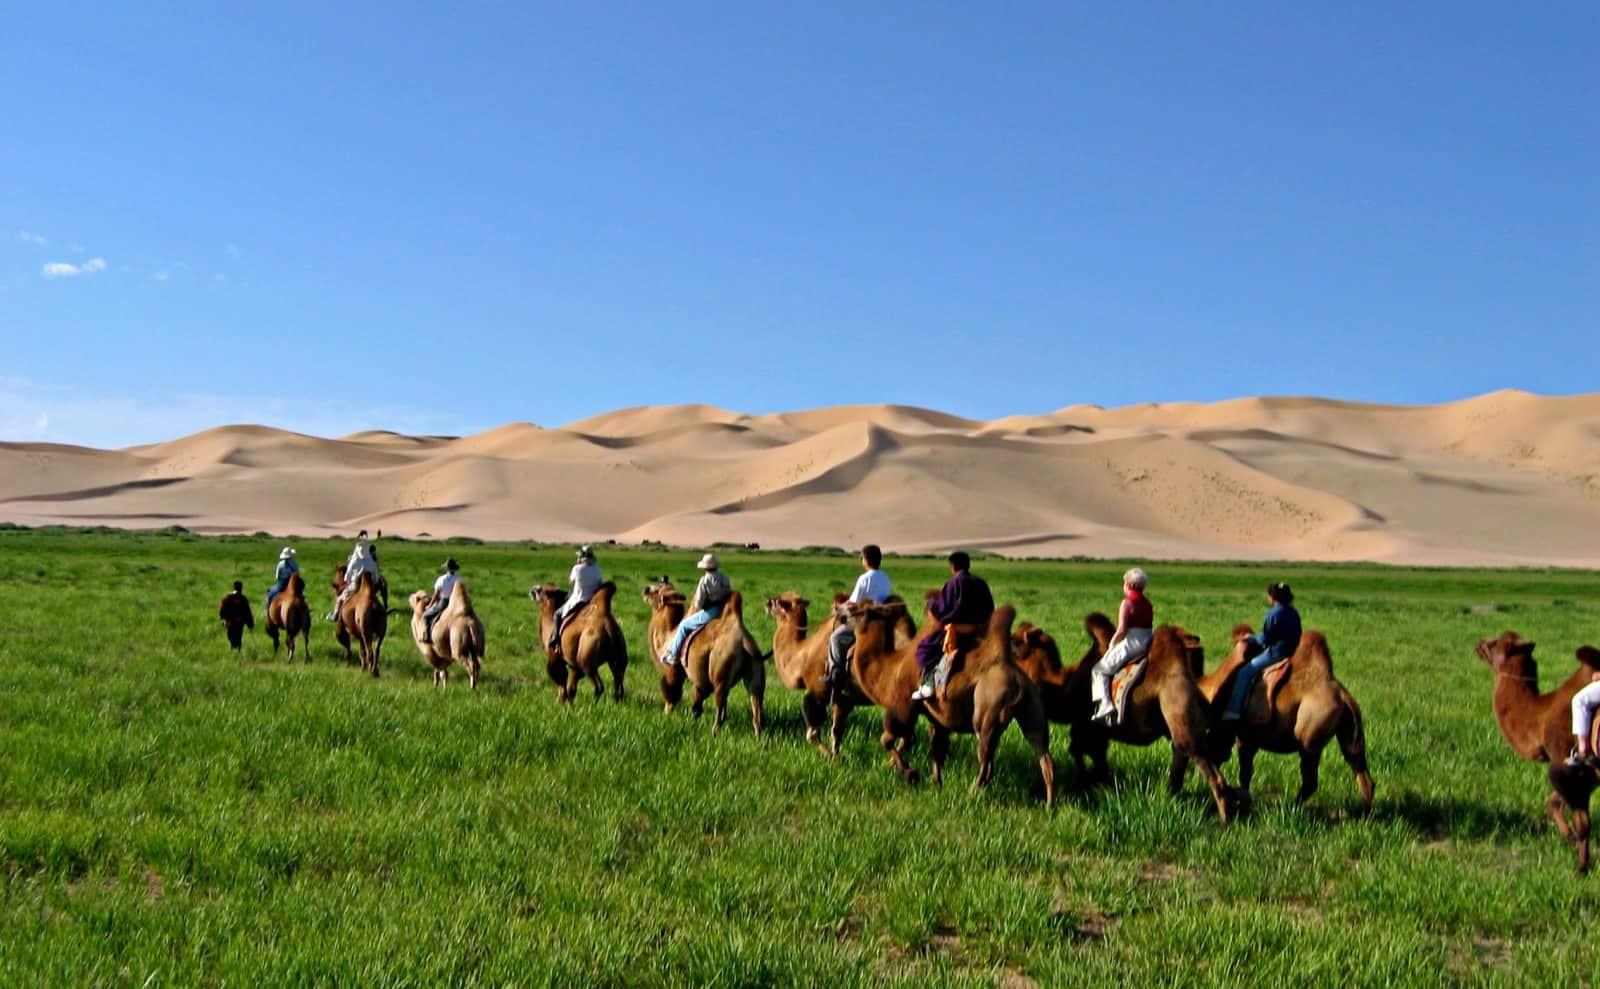 Kamelkarawane Mongolei